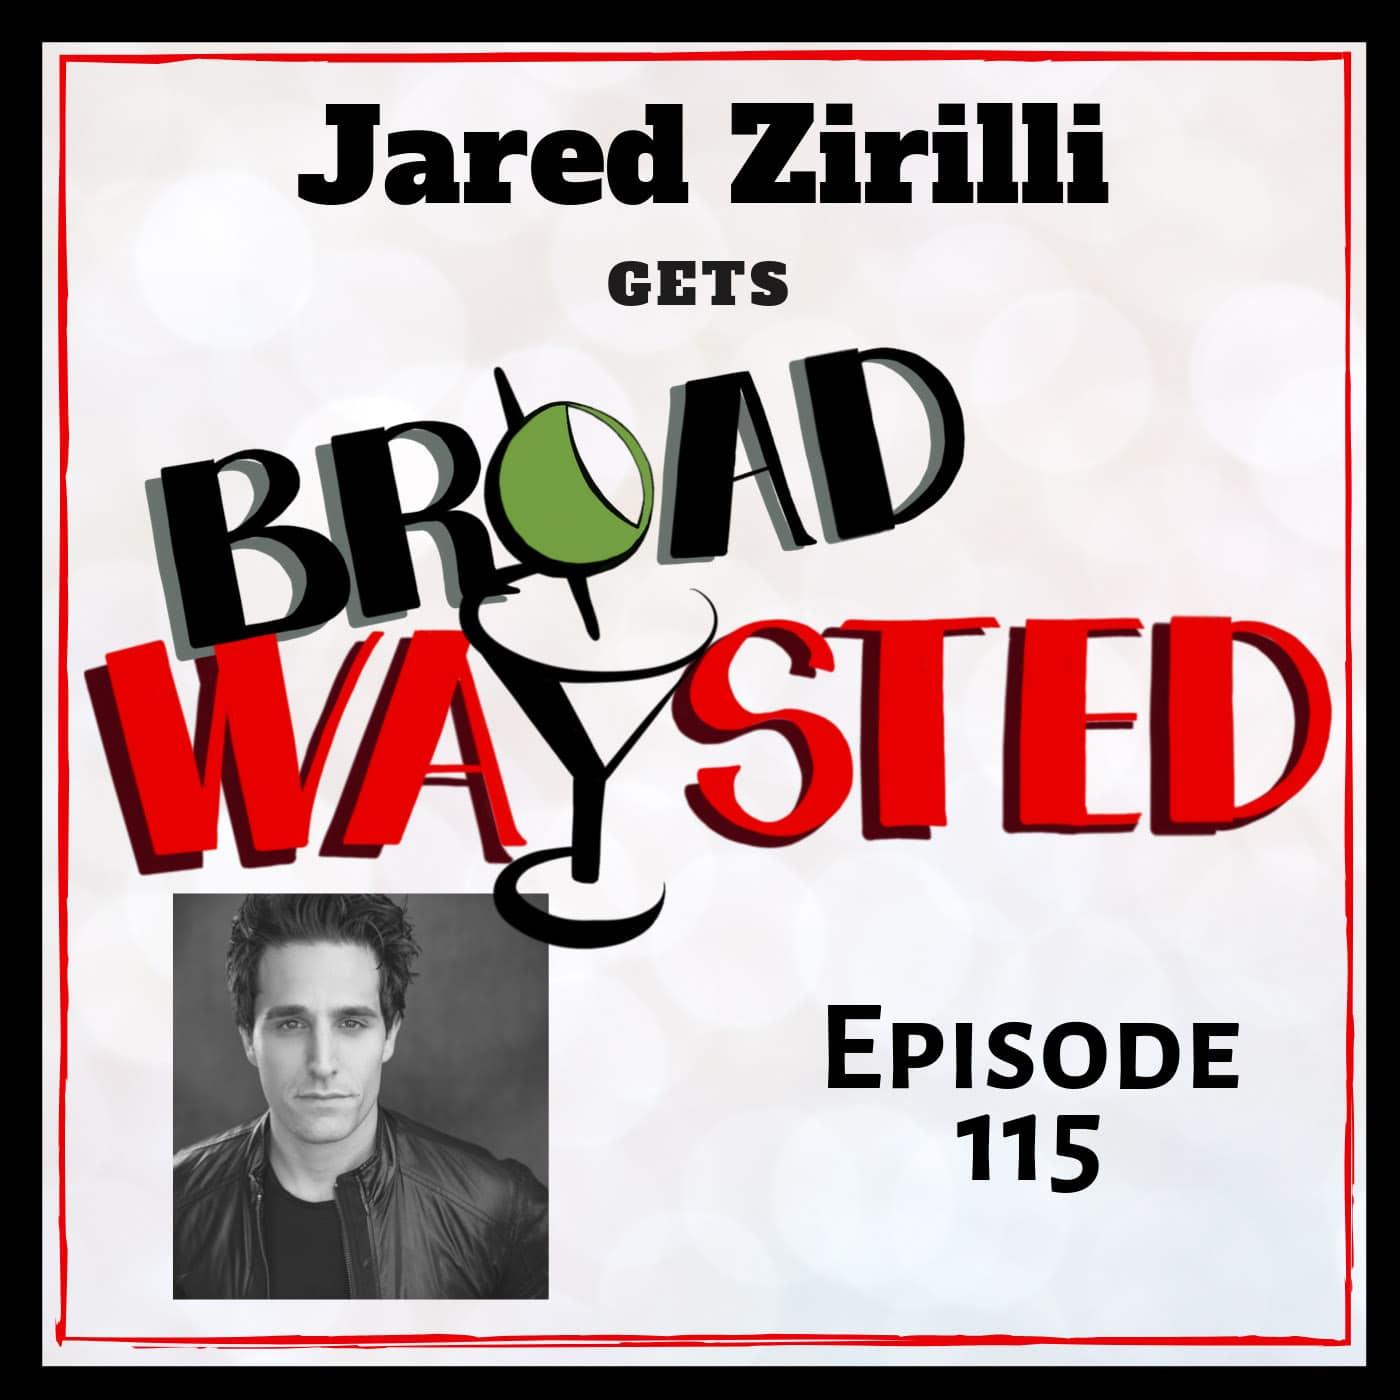 Broadwaysted Ep 115 Jared Zirilli